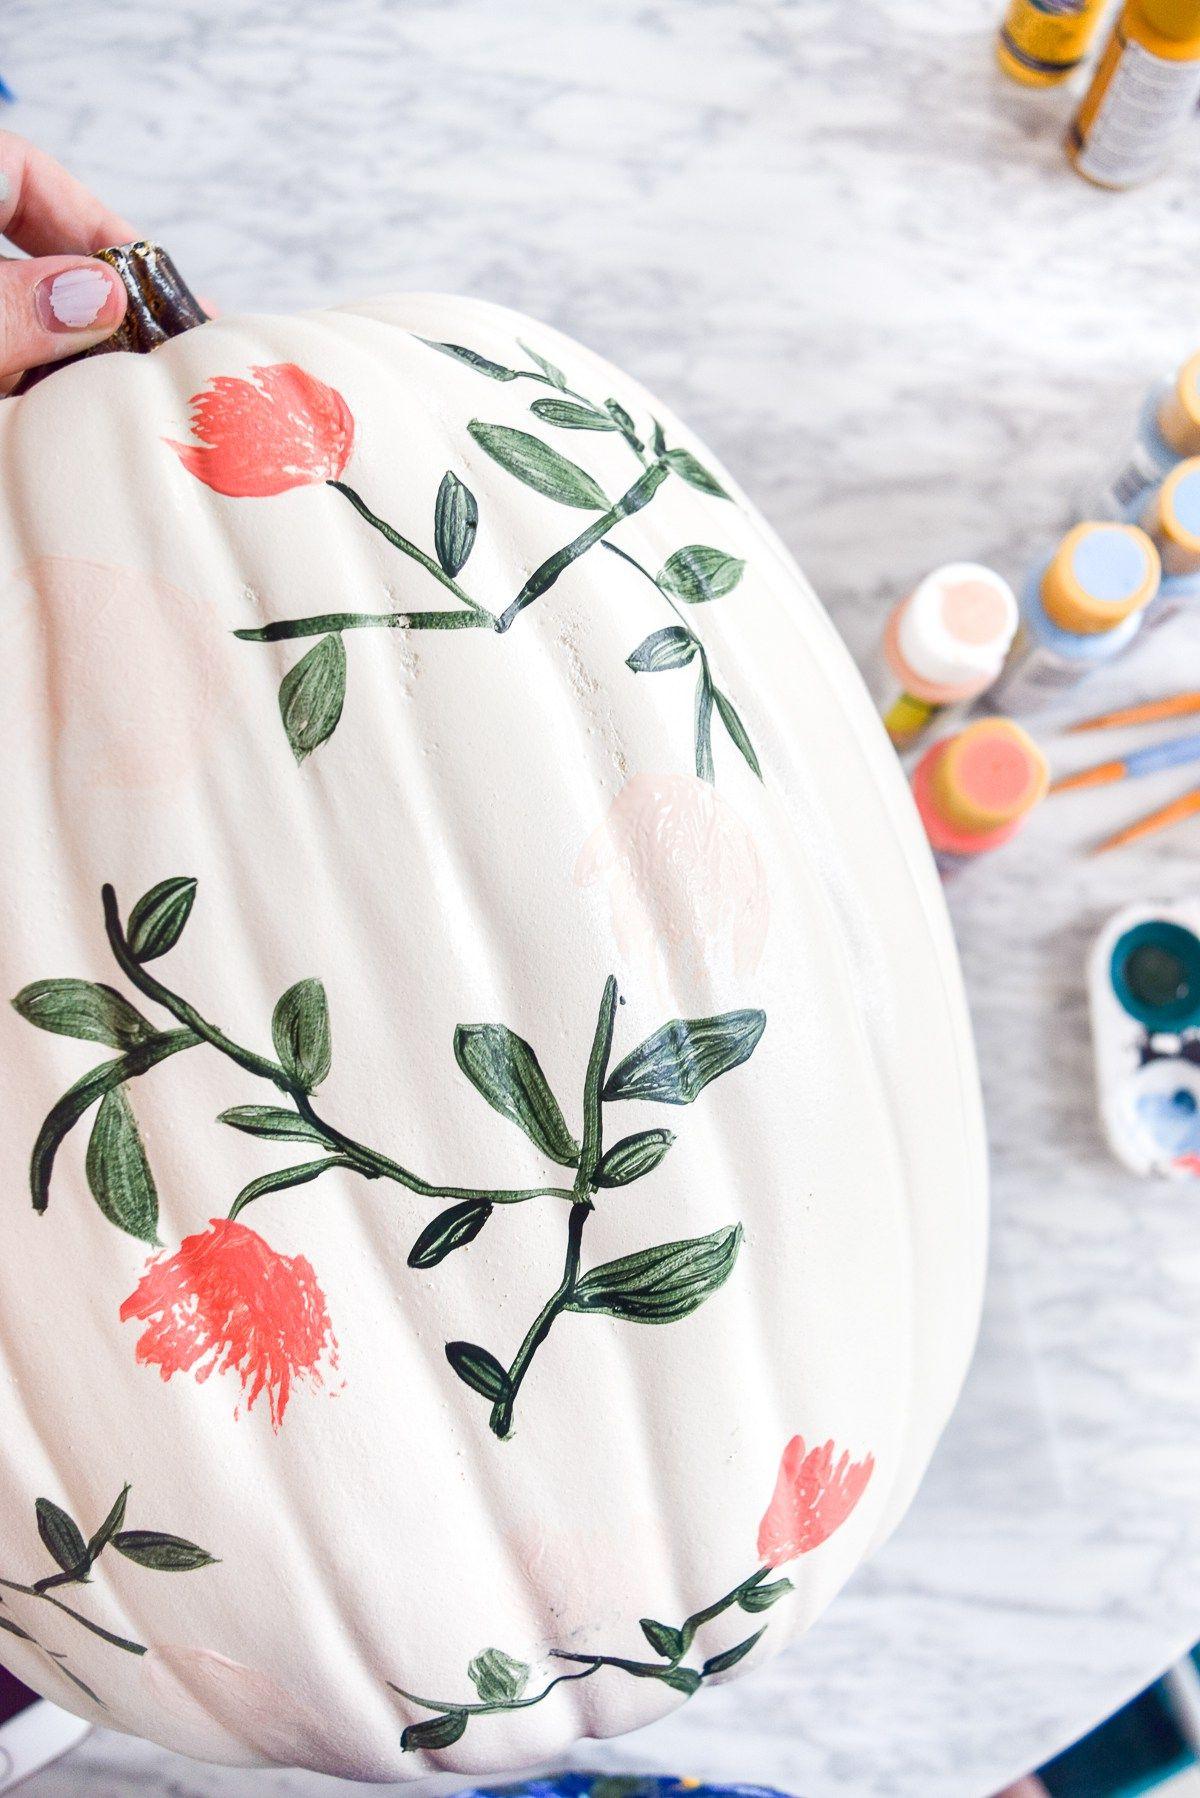 DIY Painted Pumpkins #paintedpumpkinideas